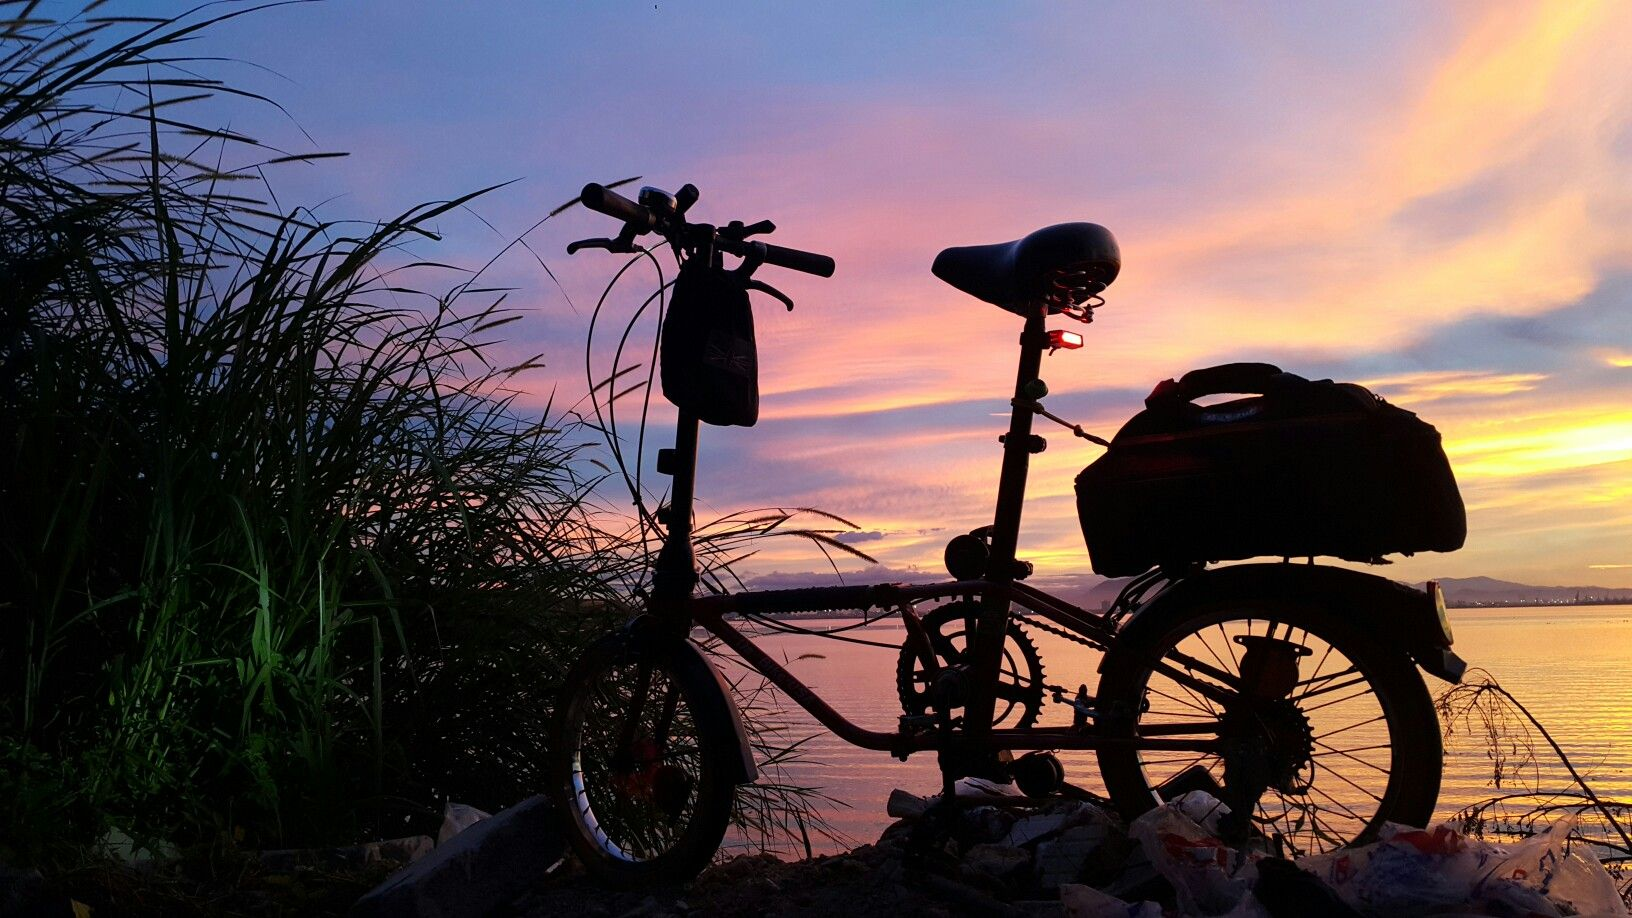 Pin By Lee Chin Huat On Dahon Classic Dahon Types Of Folds Bike